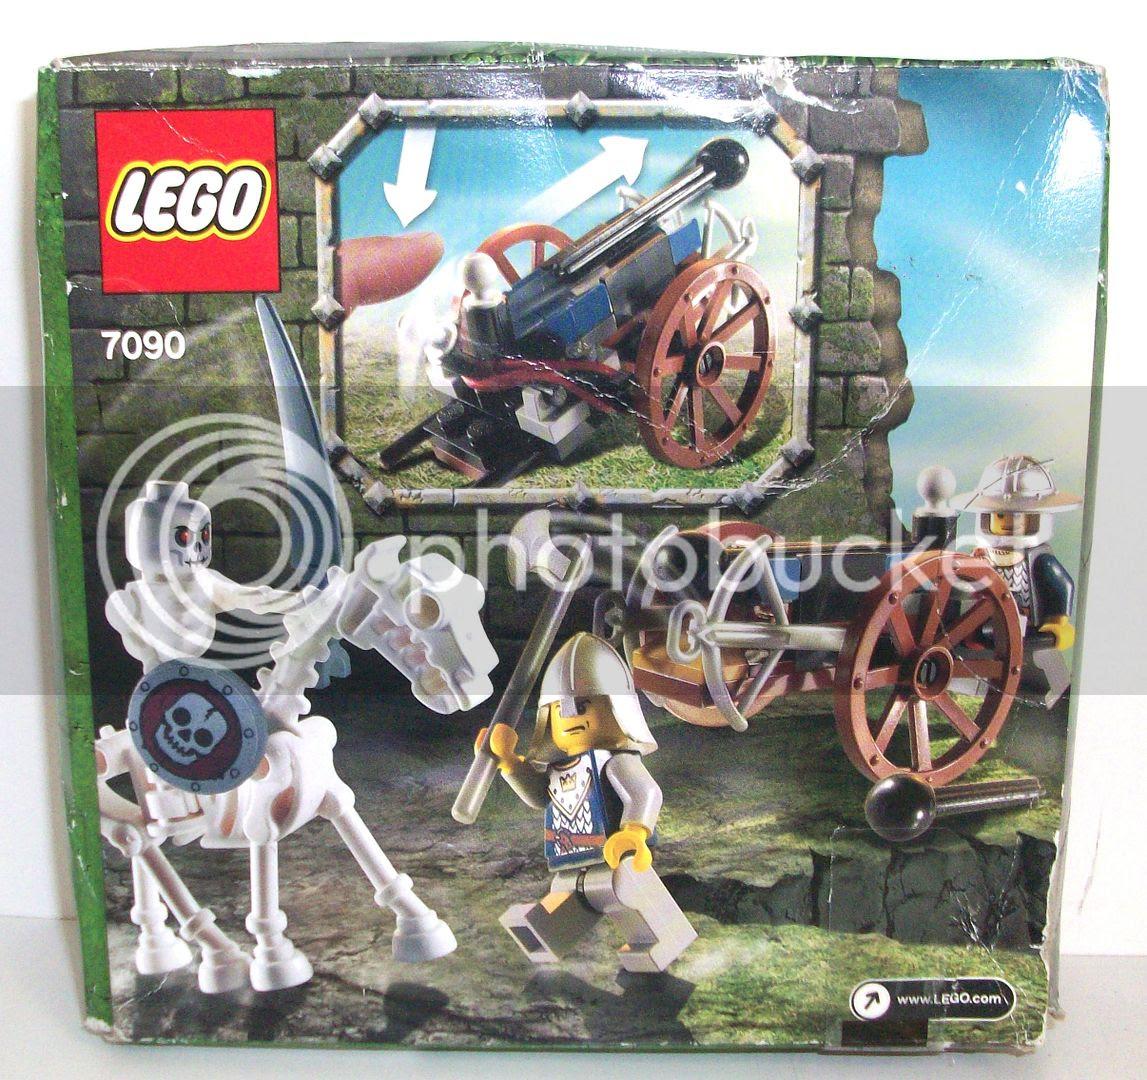 Lego #7090 photo 100_5015_zps01d551cf.jpg